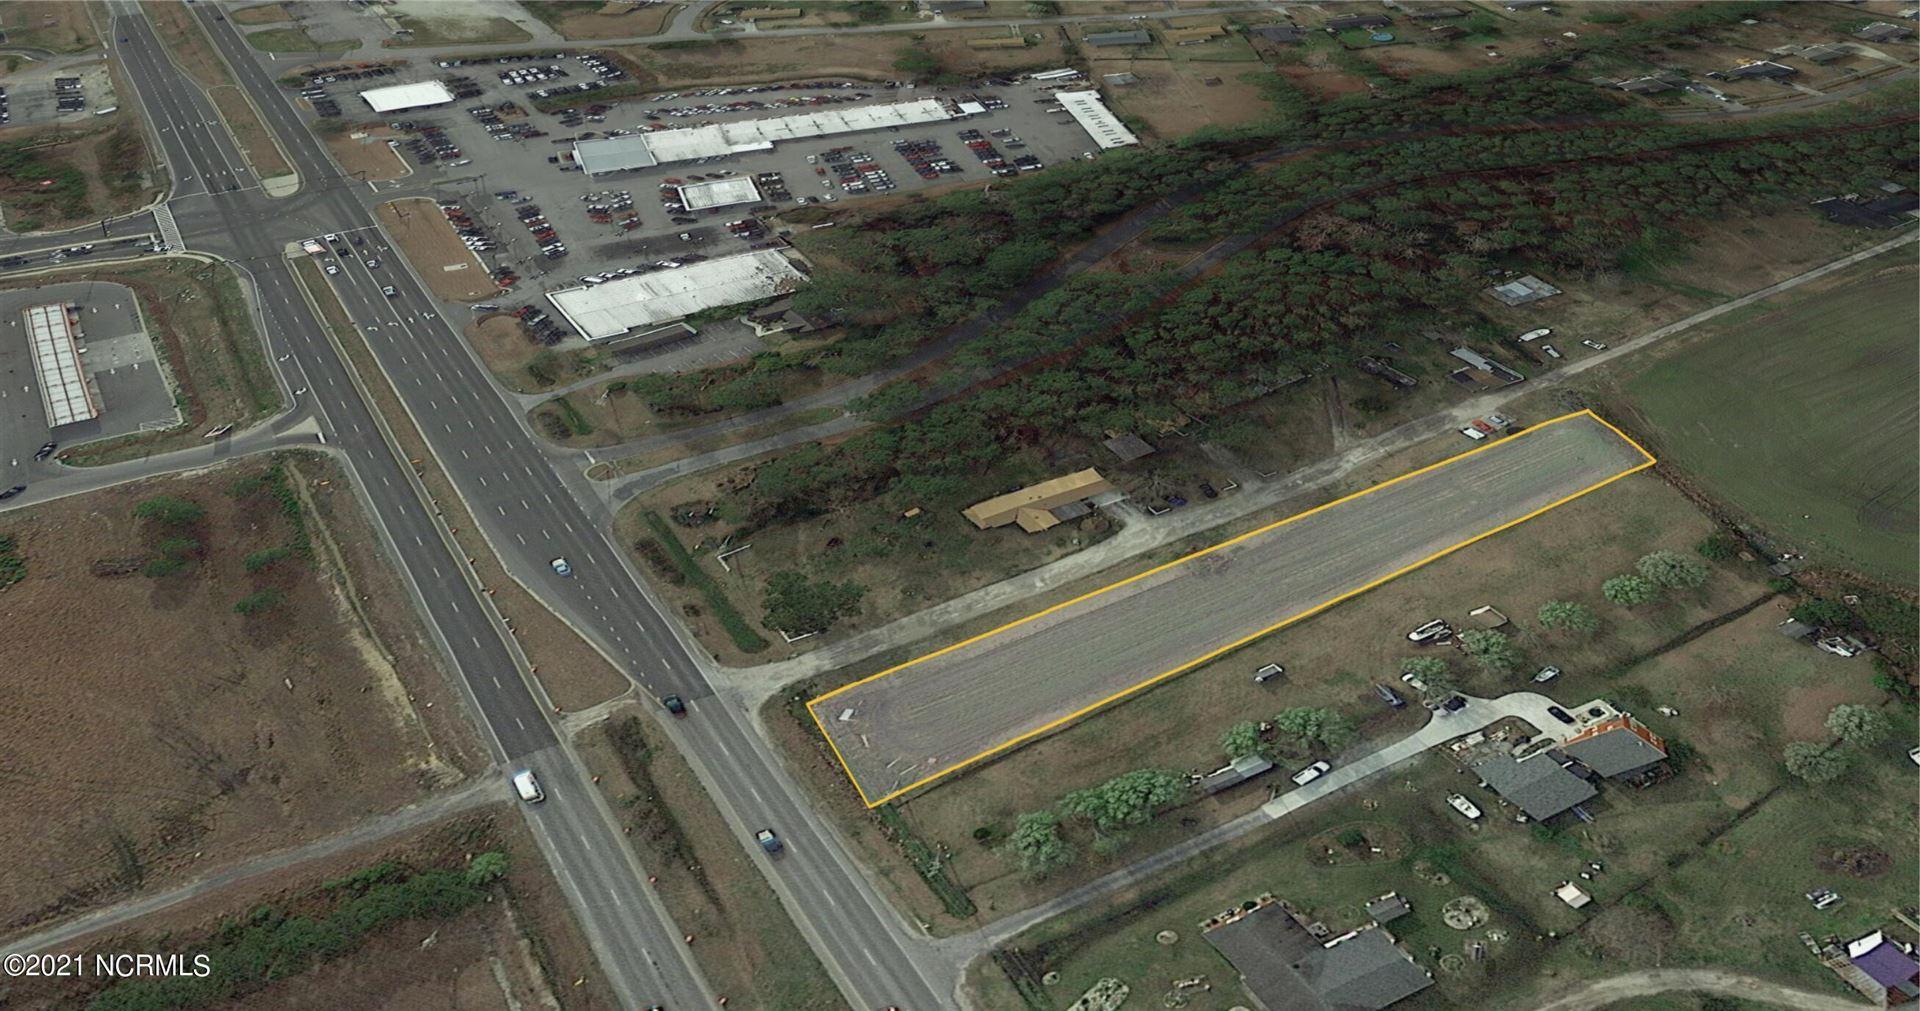 Photo of 1 New Bern Highway, Jacksonville, NC 28546 (MLS # 100232002)